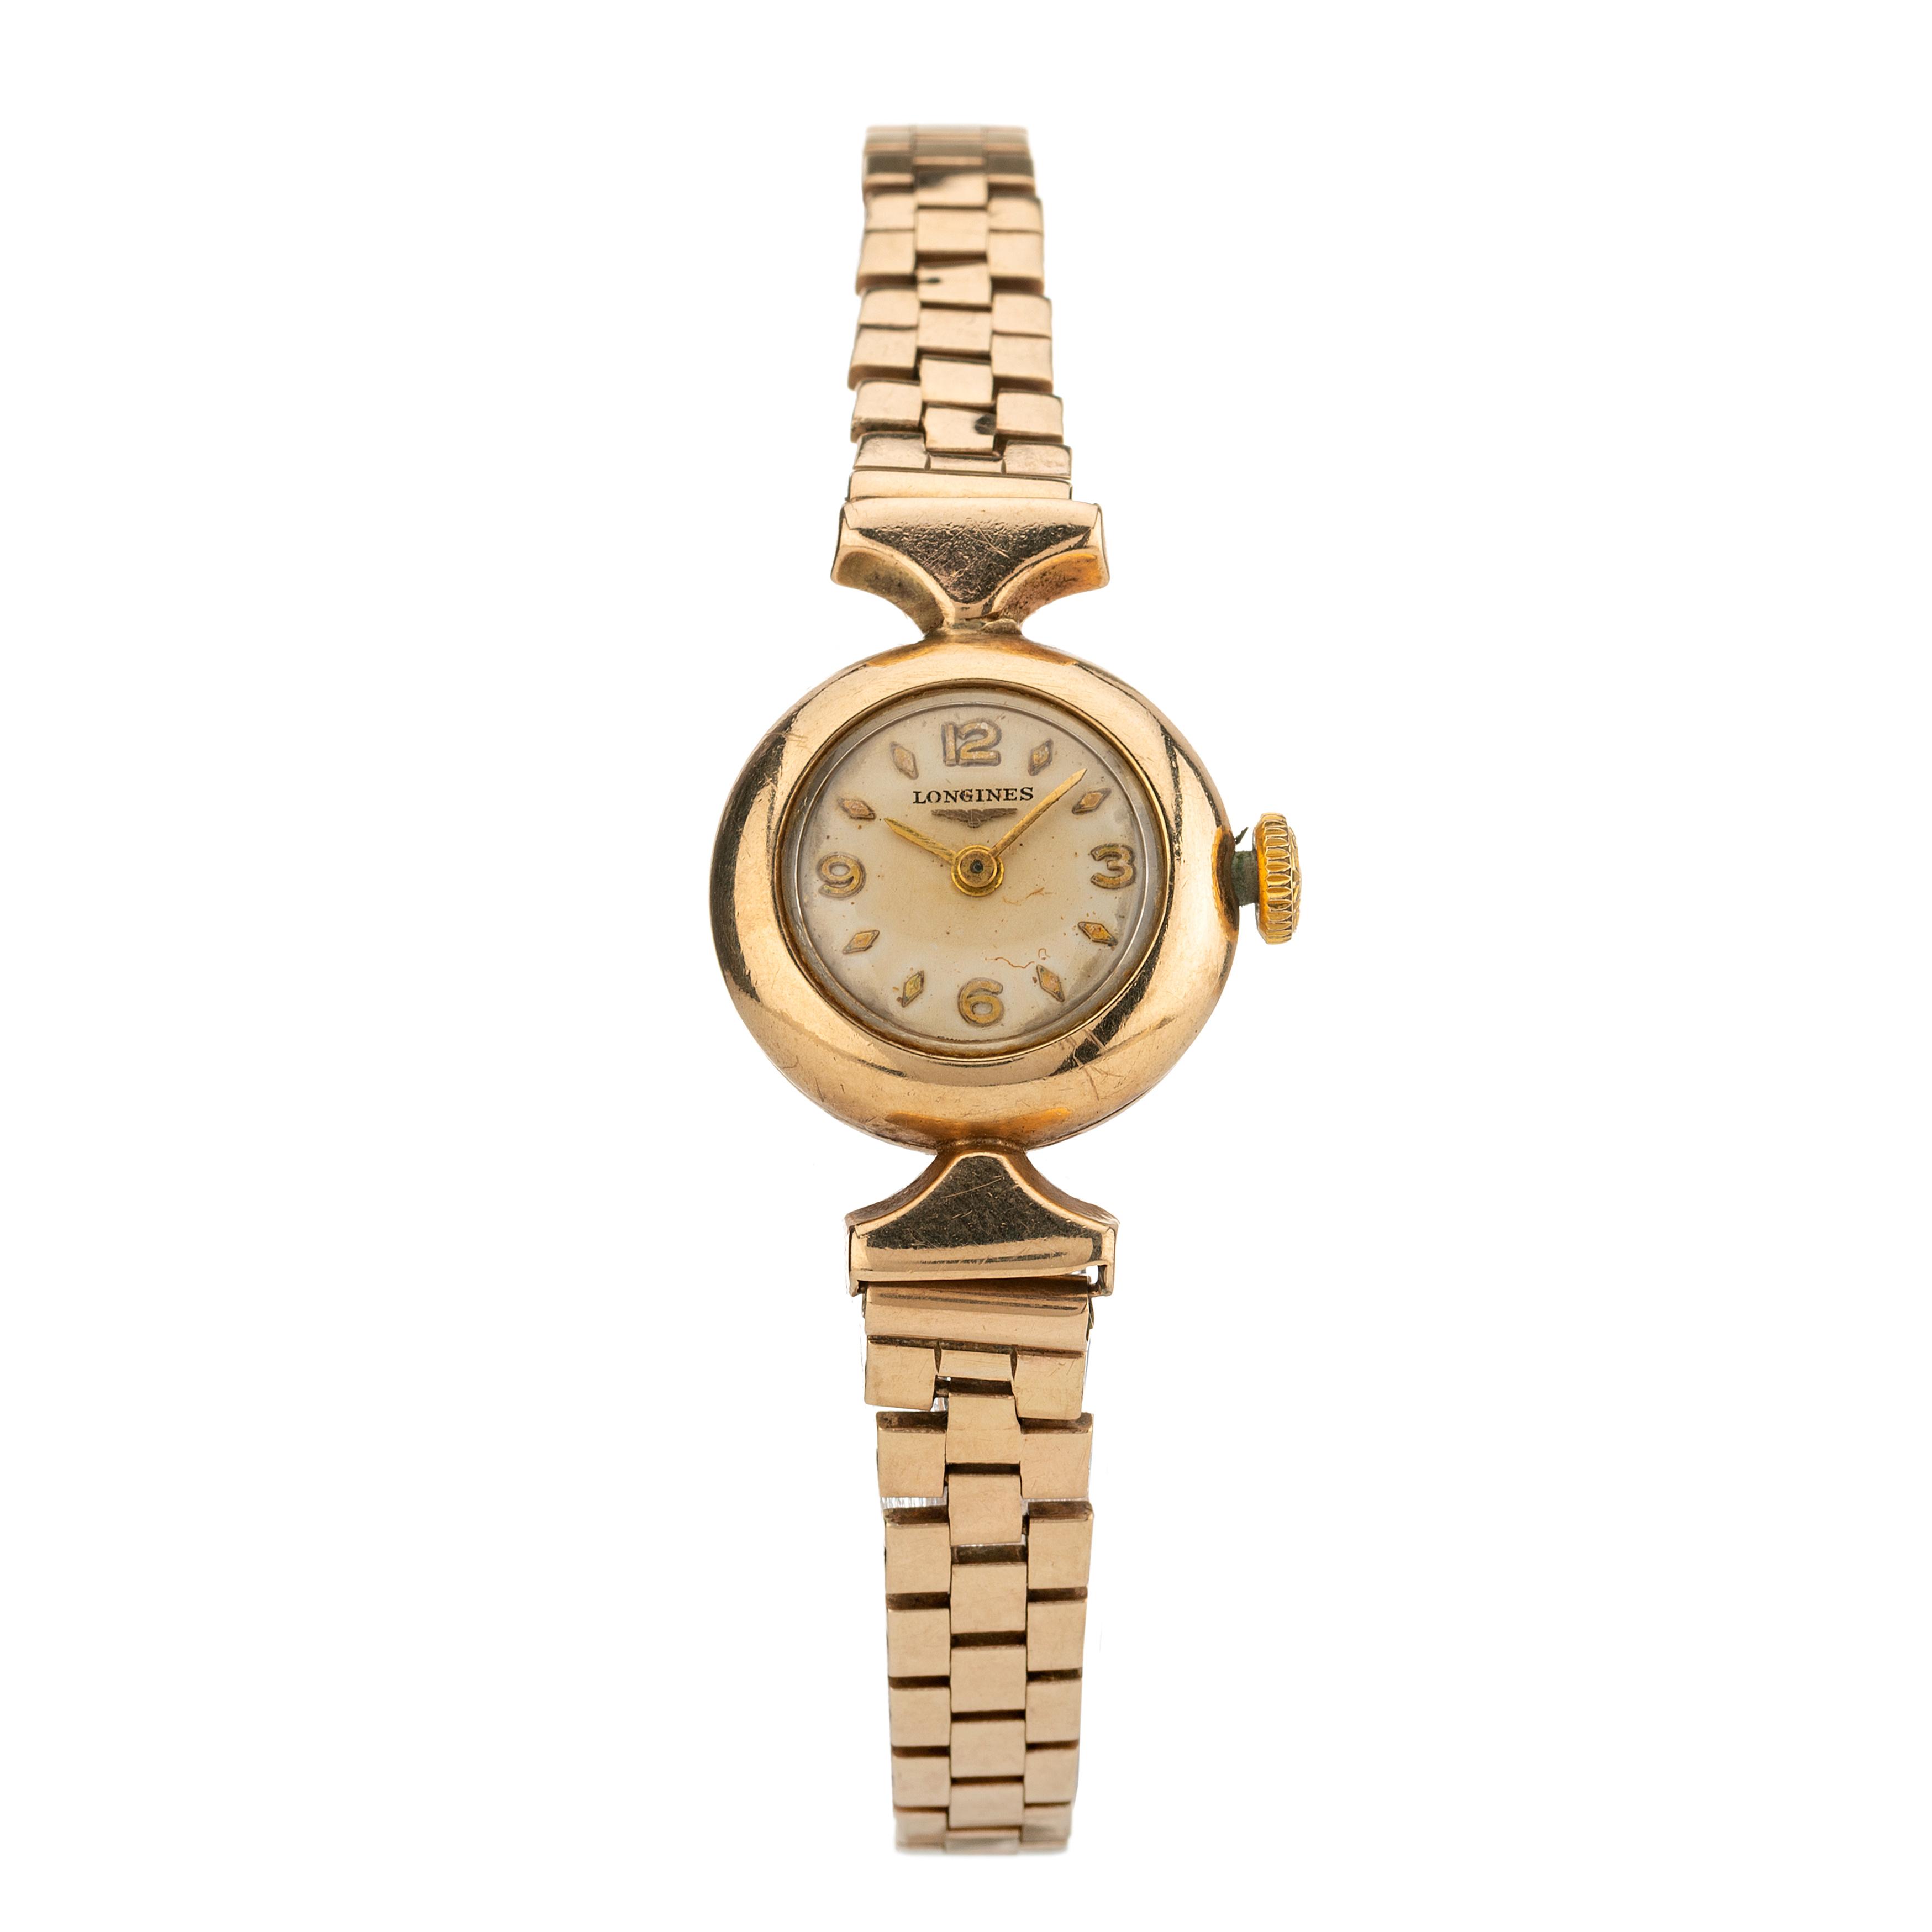 Longines, a mid 20th century 9ct gold bracelet watch